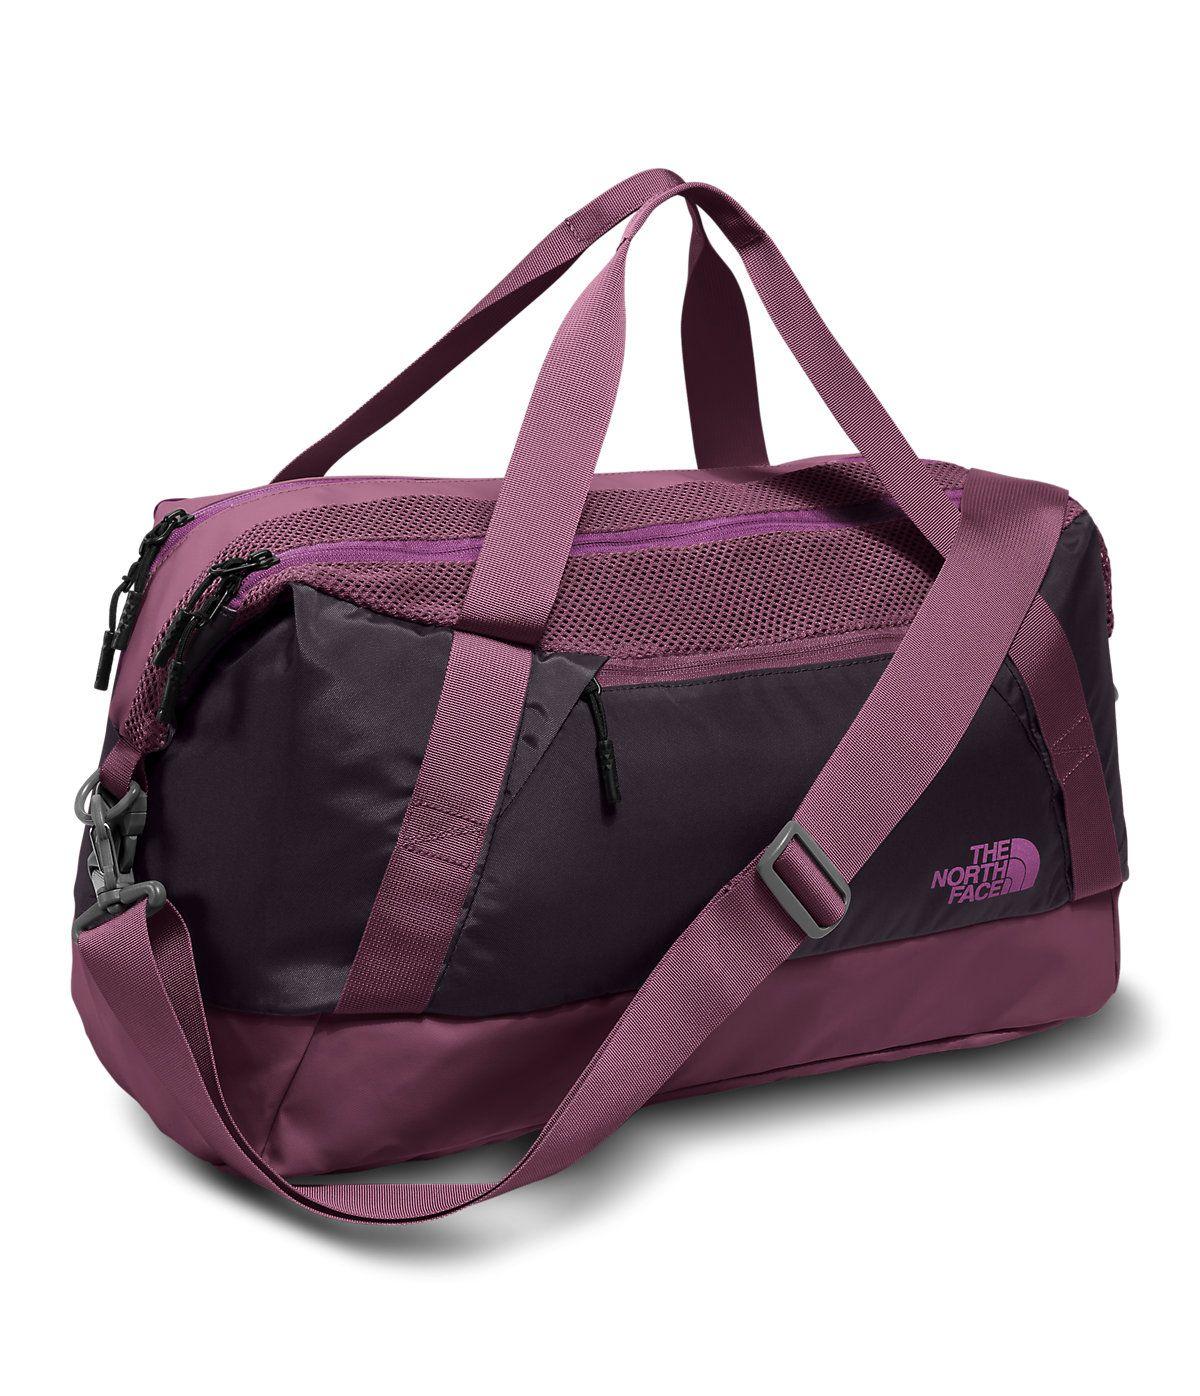 92dd5a889a The North Face Apex Gym Small Duffel Bag